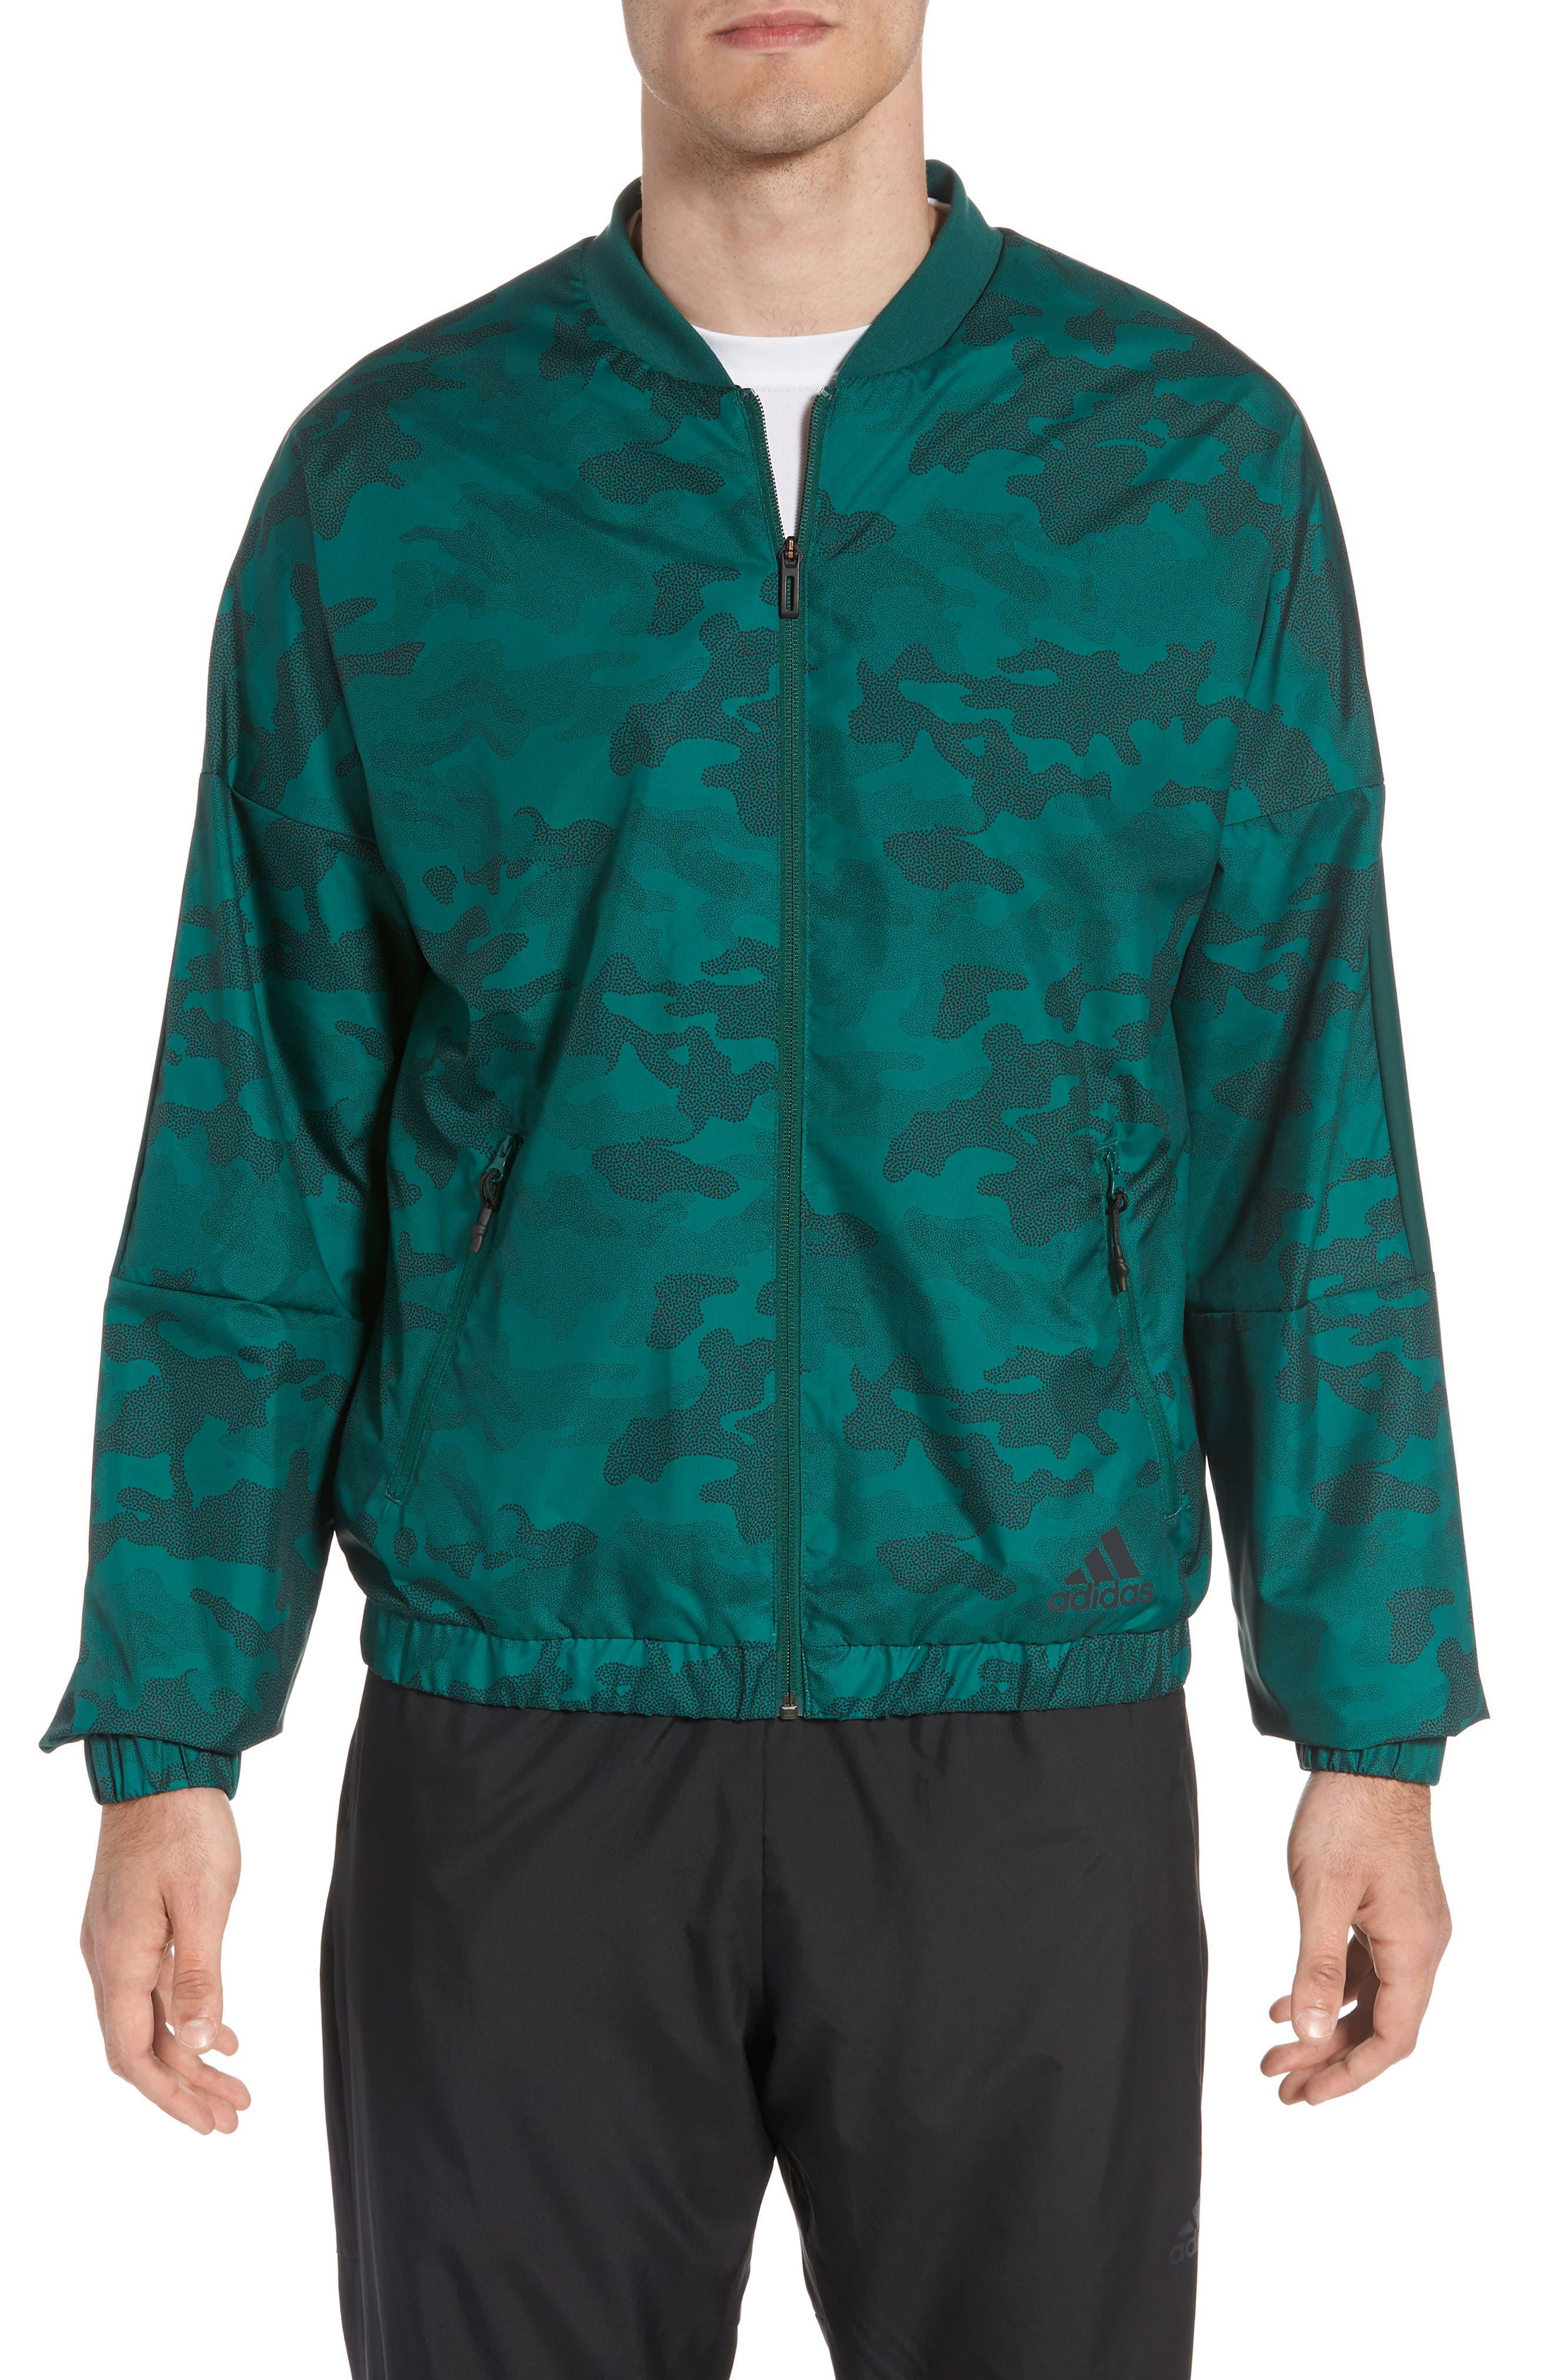 Regular Fit Track Jacket,                         Main,                         color, Collegiate Green/ Black